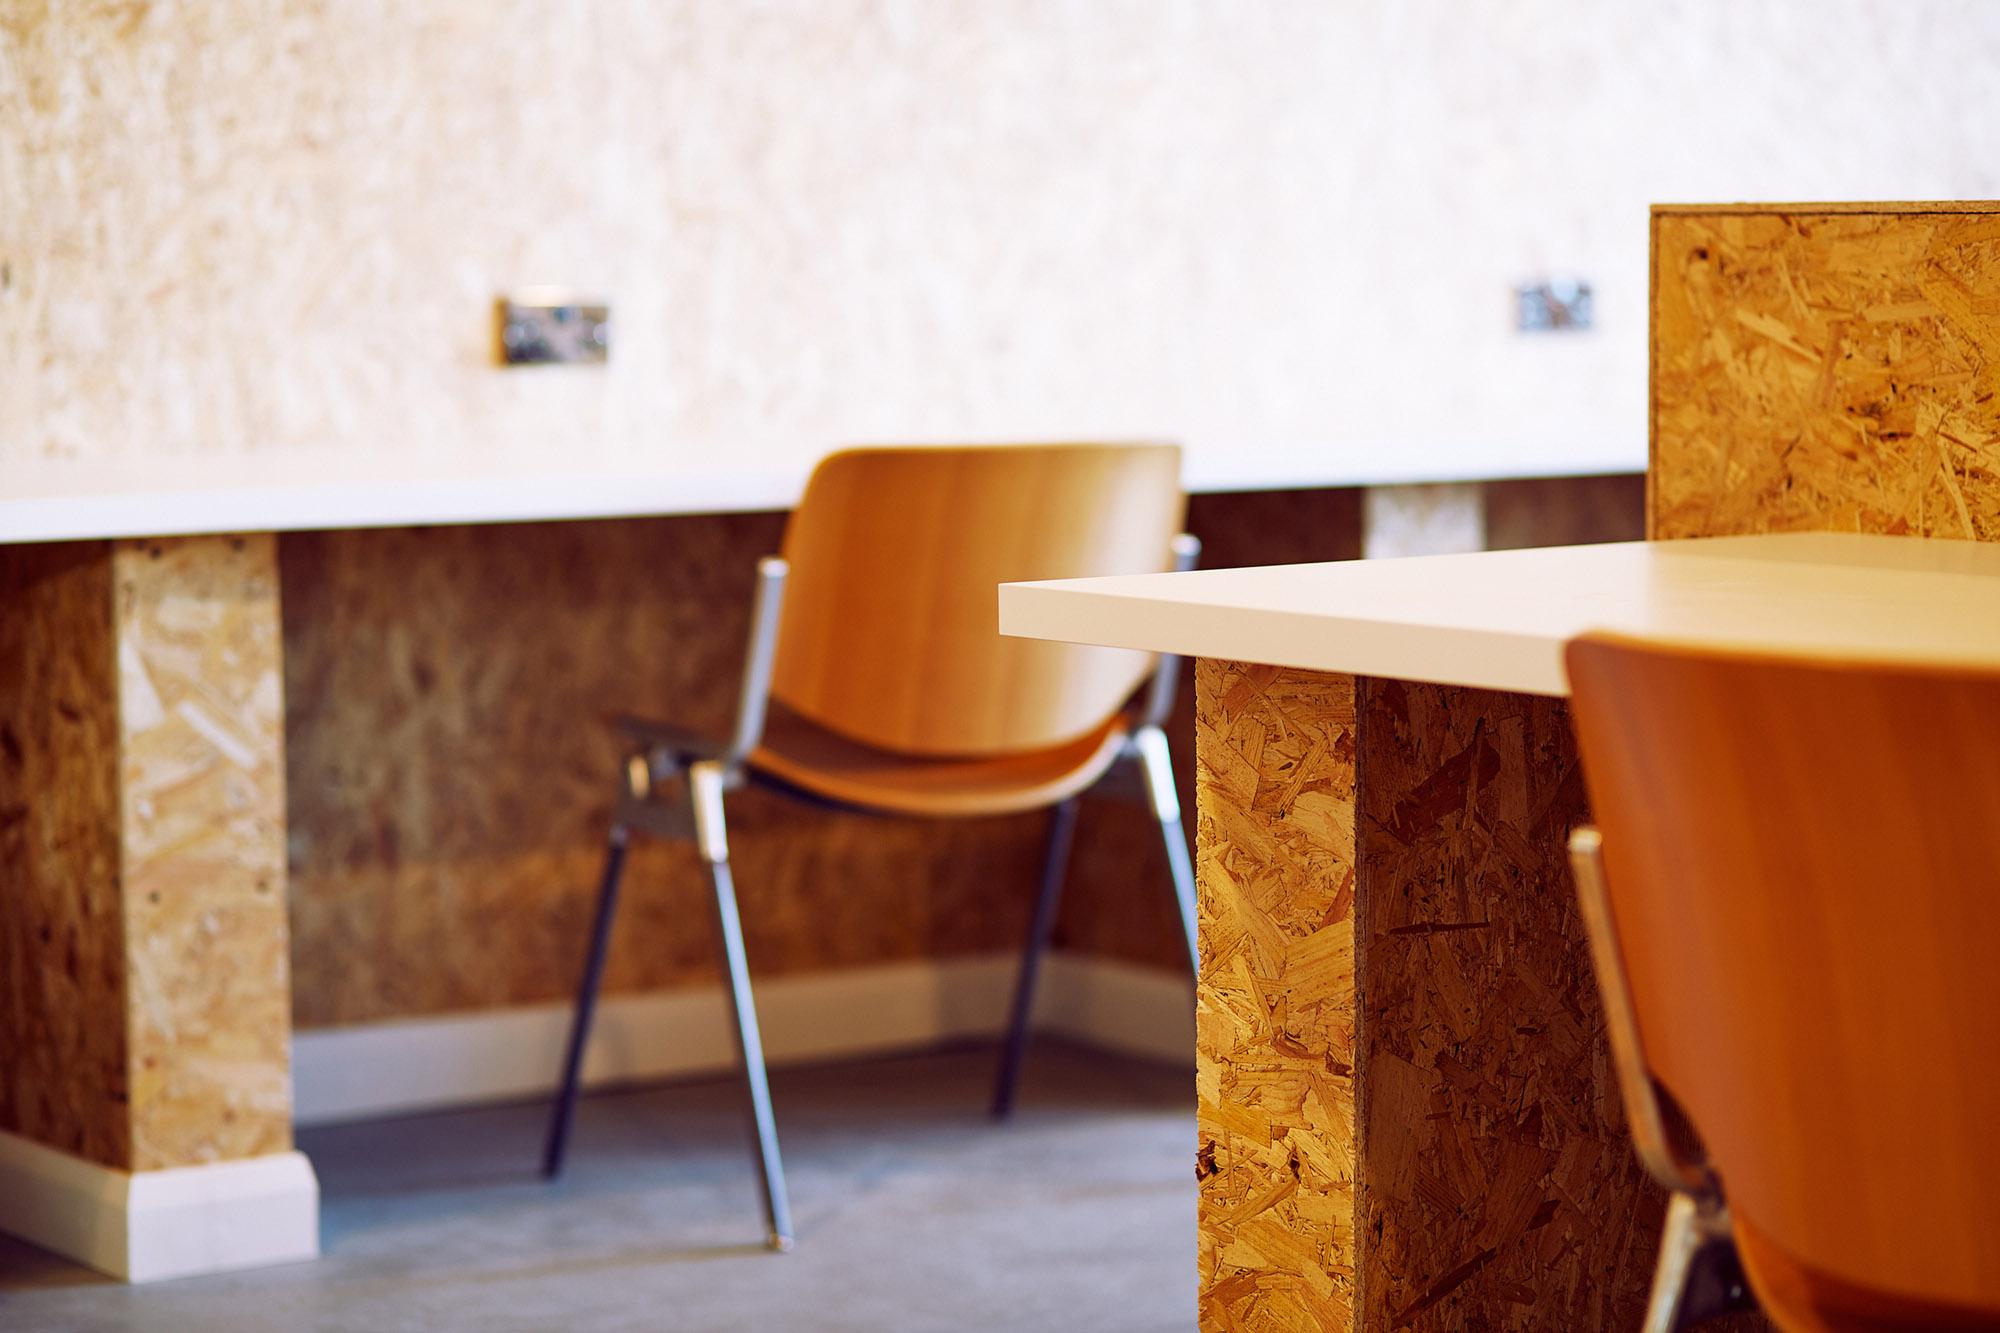 desk-space0229 copy.jpg